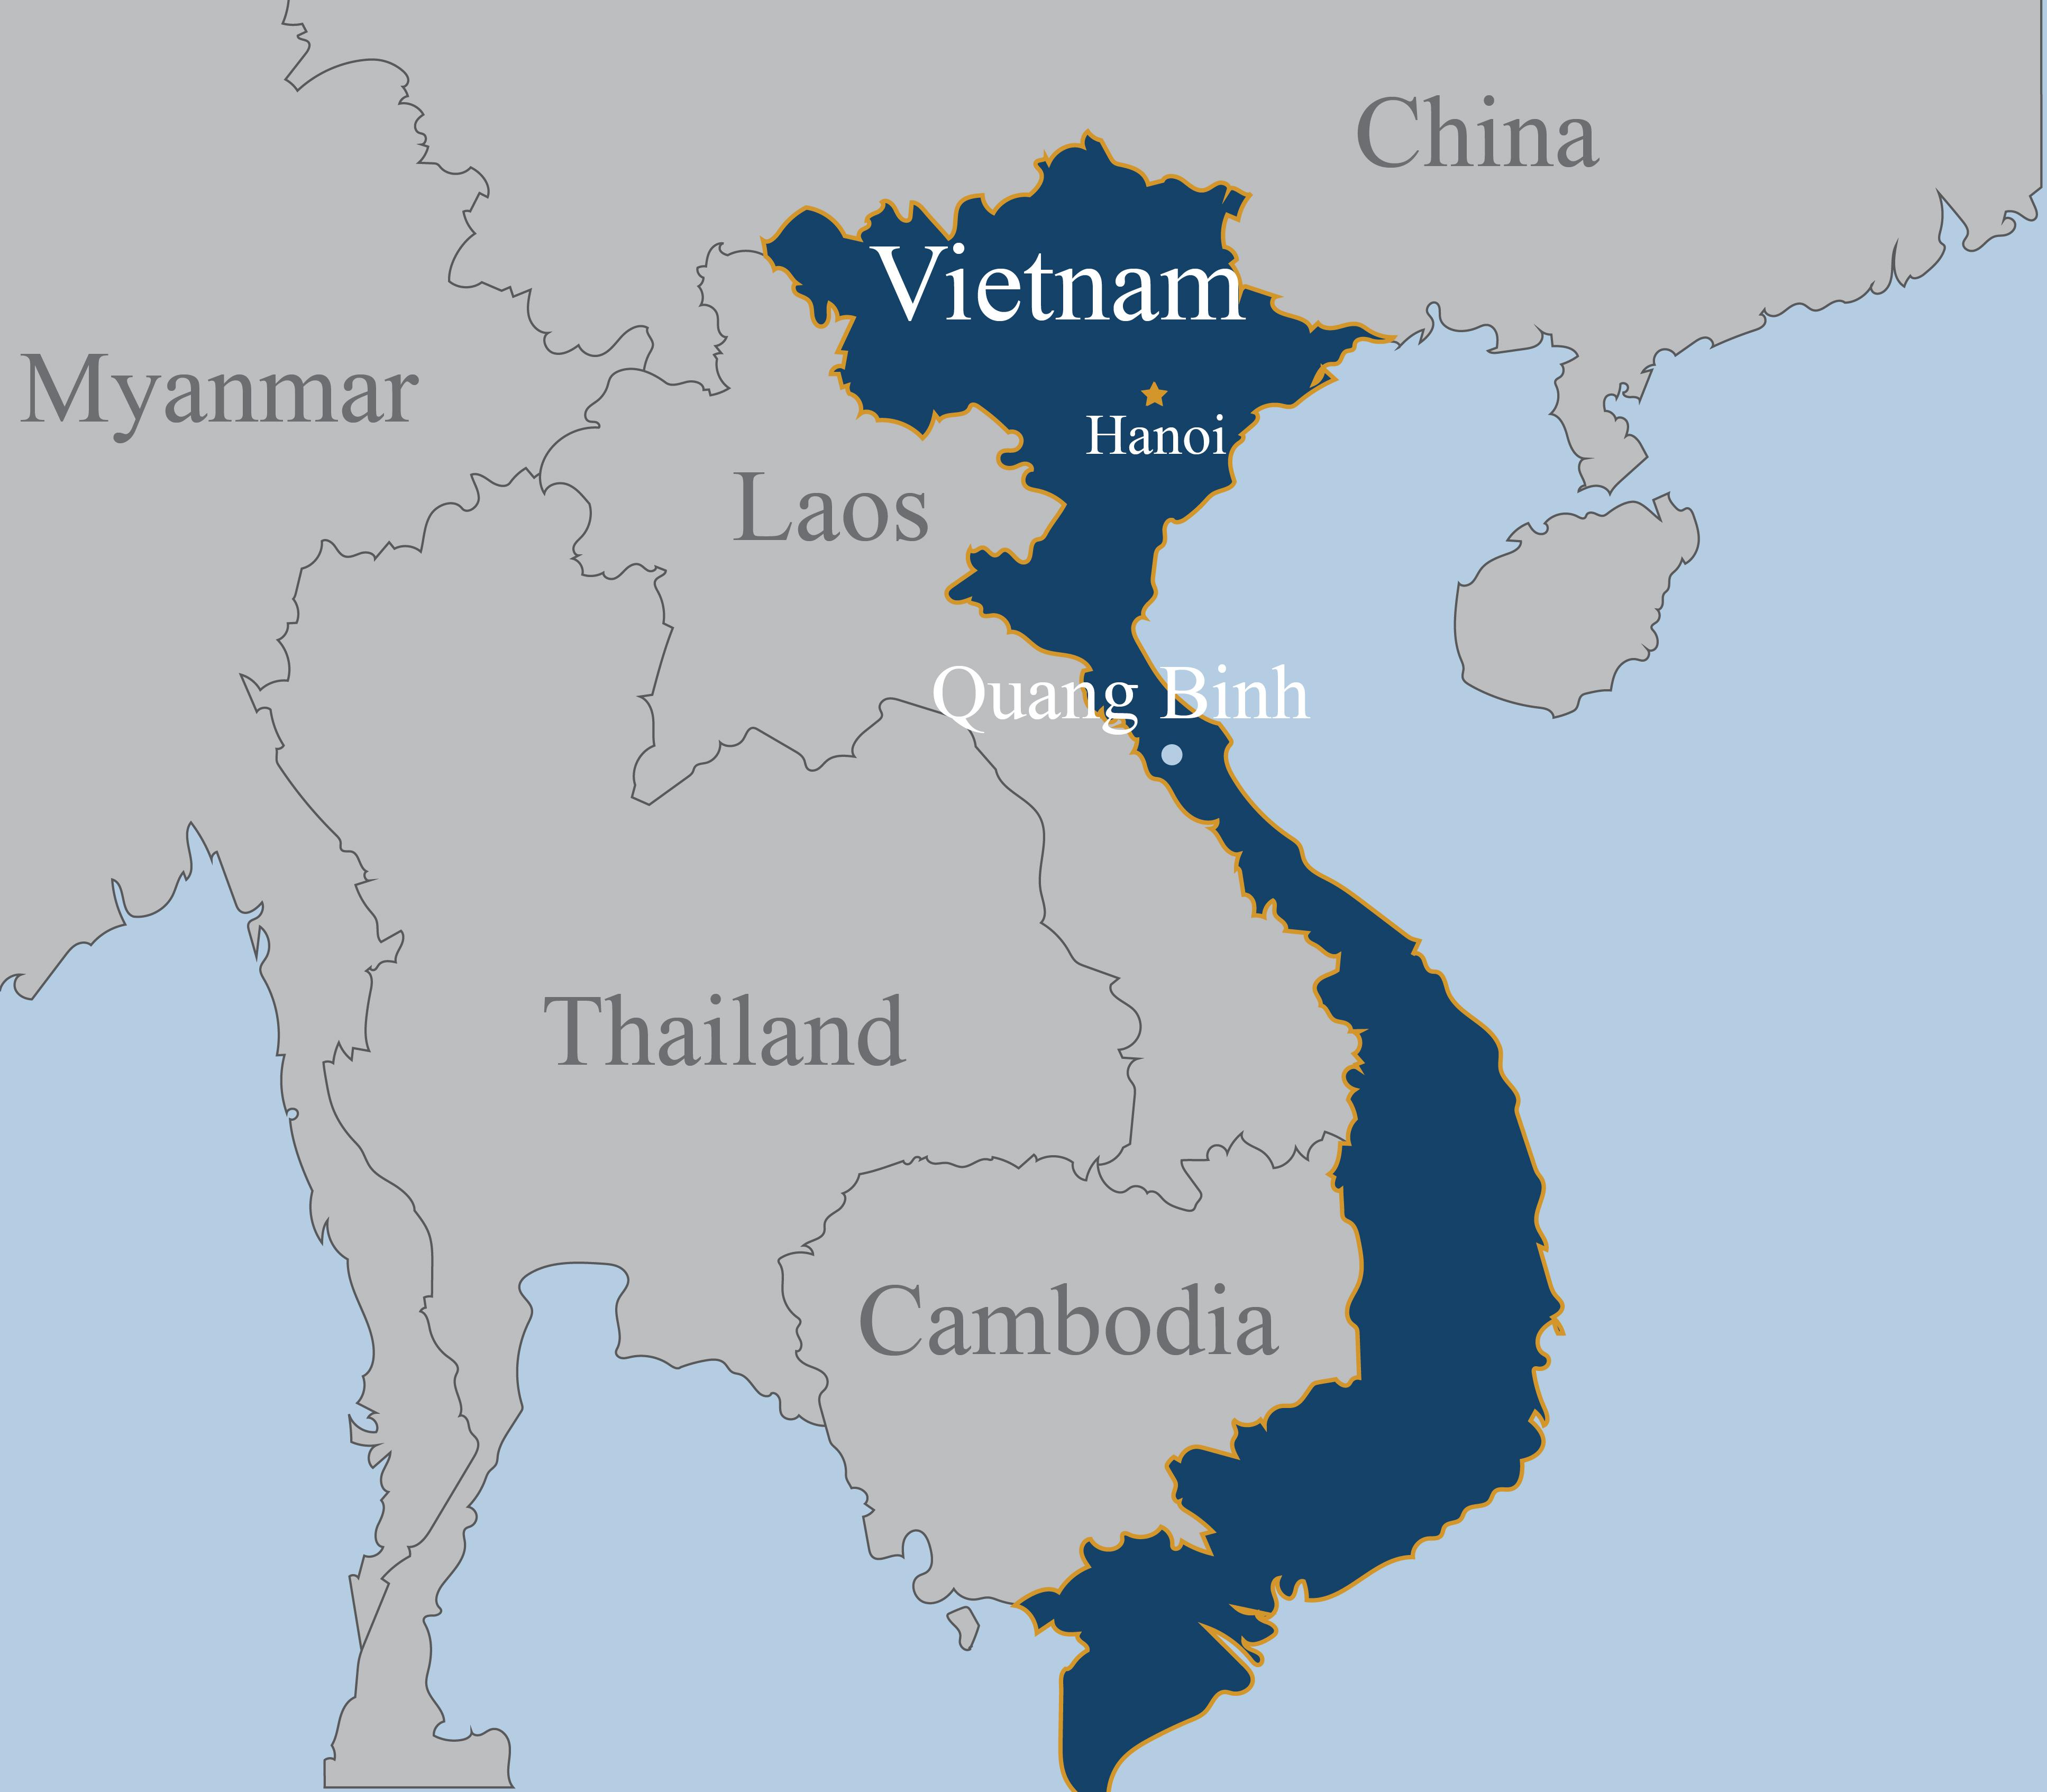 Quang_Binh_in_Vietnam.svg